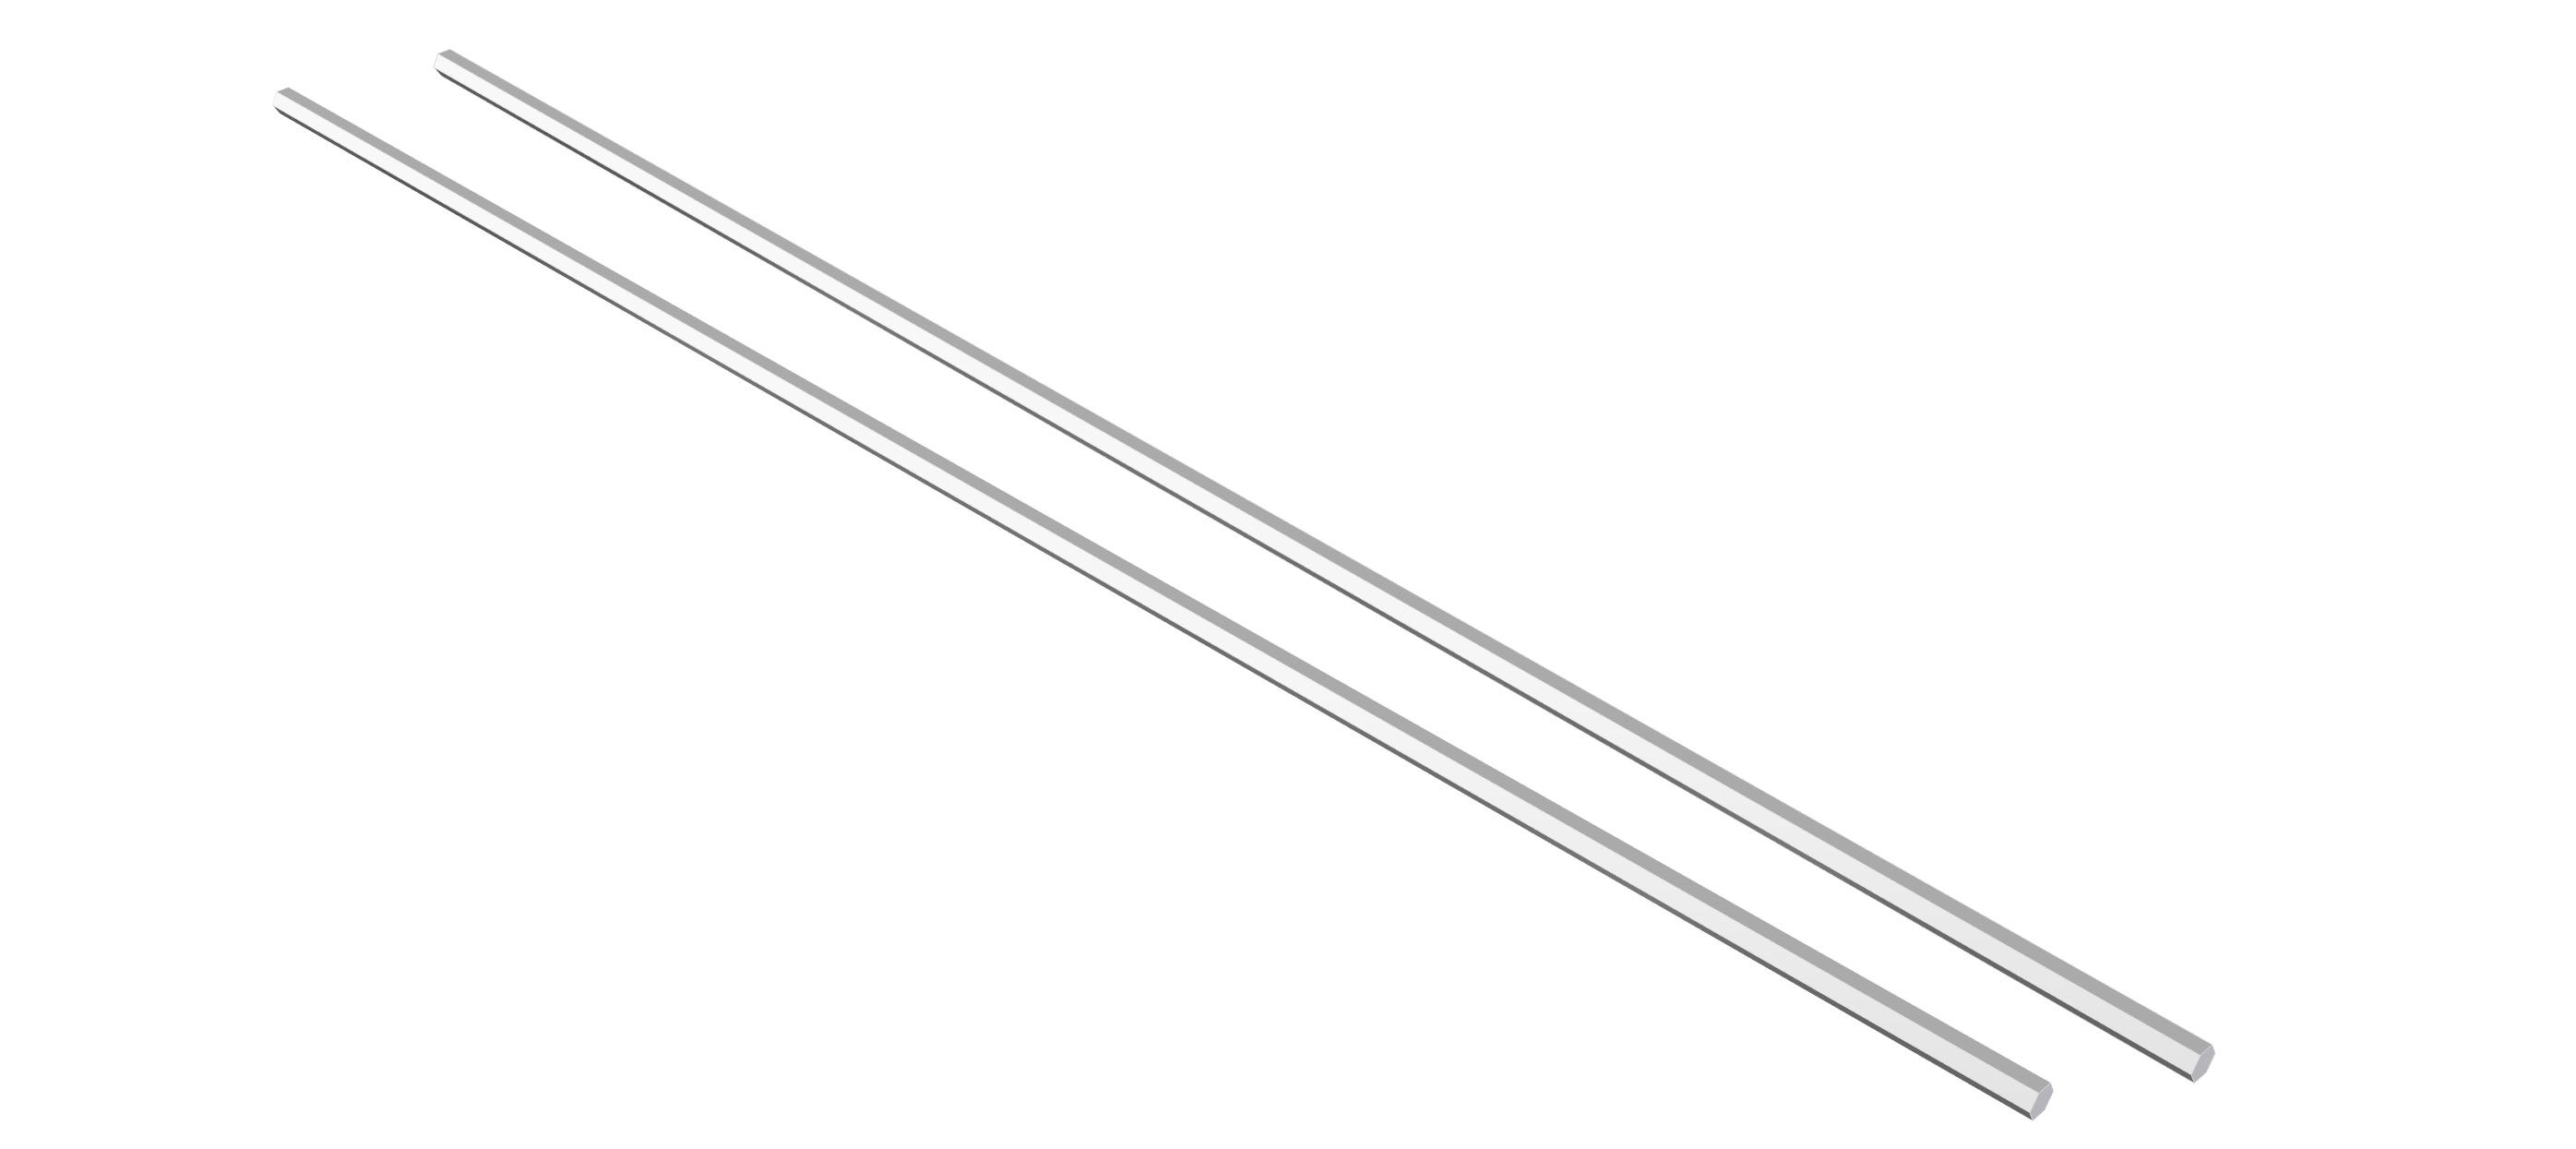 Axle Kit for Tilmor Basket Weeder